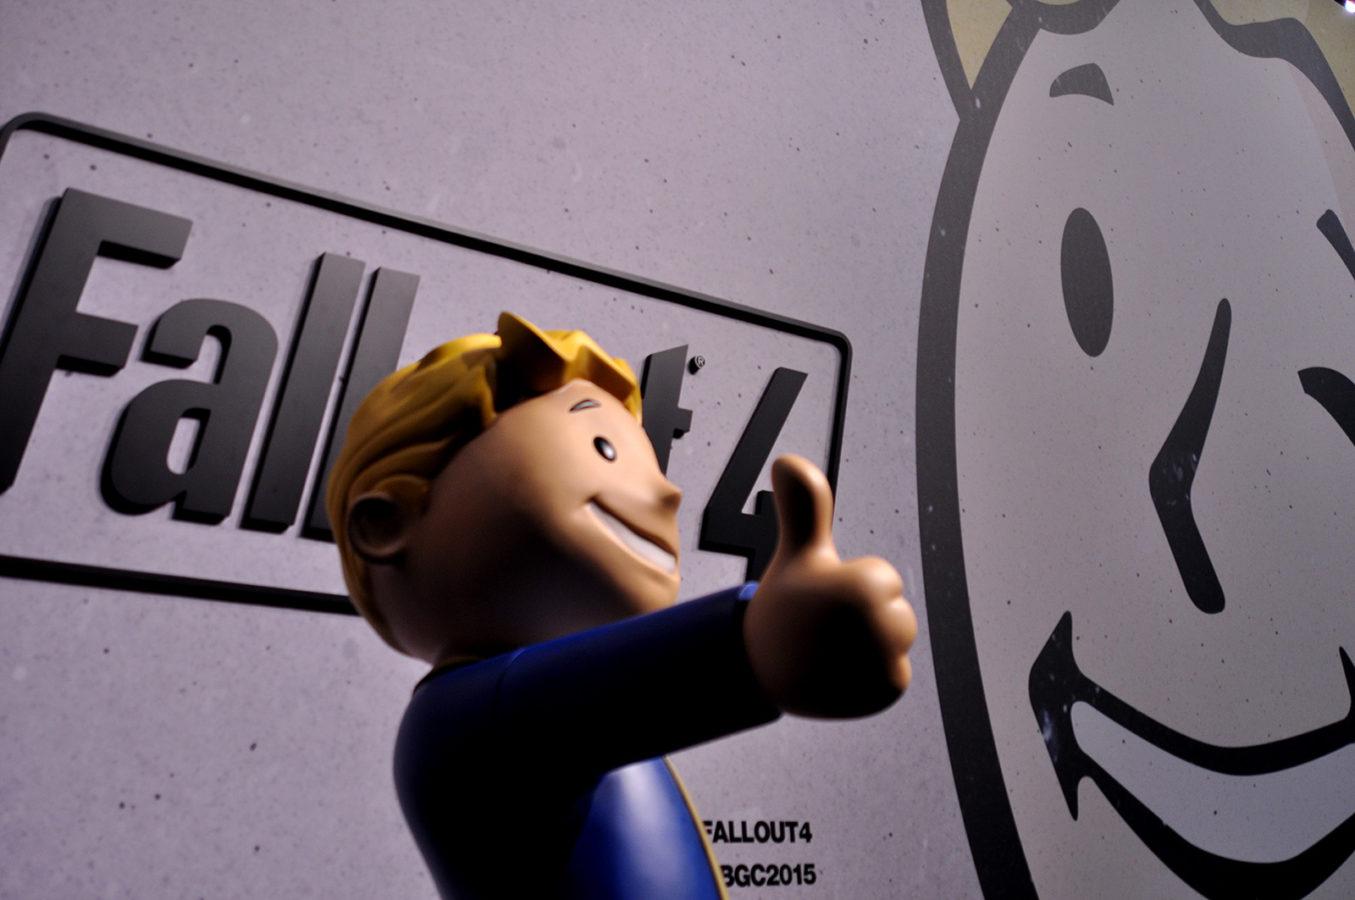 Fallout 4 Gamescom 2015